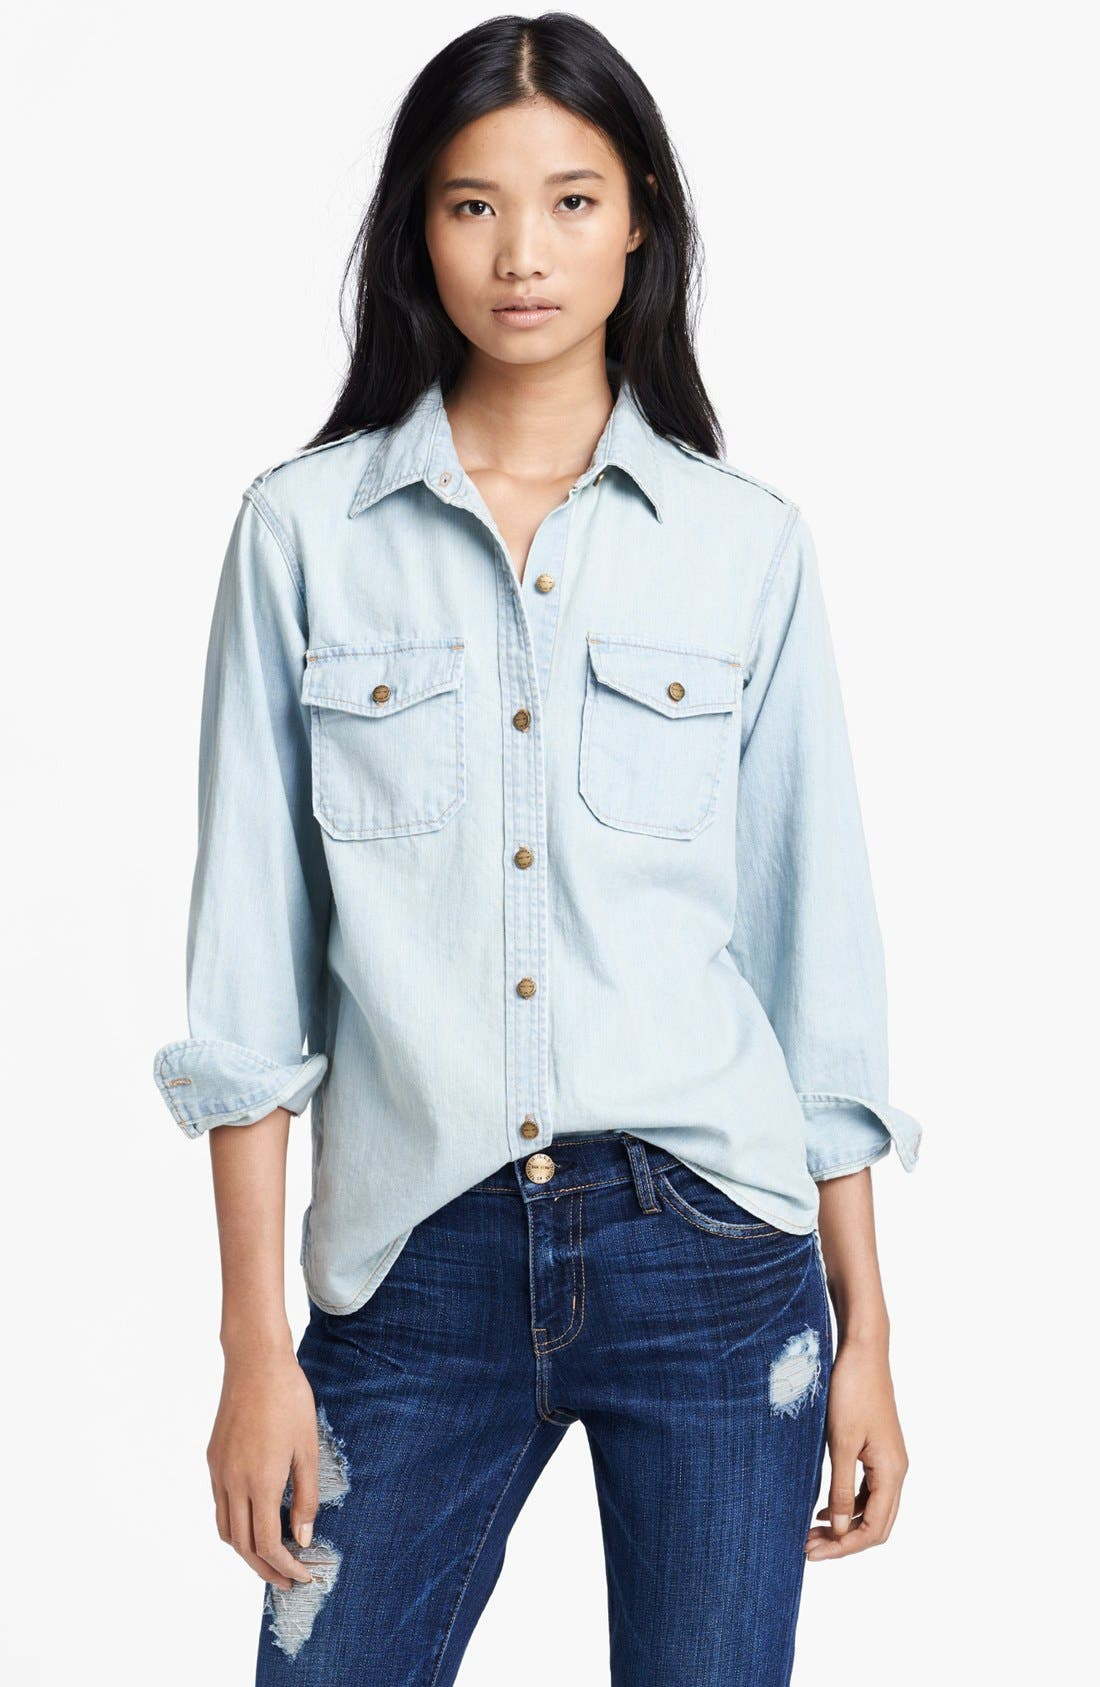 Main Image - Current/Elliott 'The Perfect' Button Front Denim Shirt